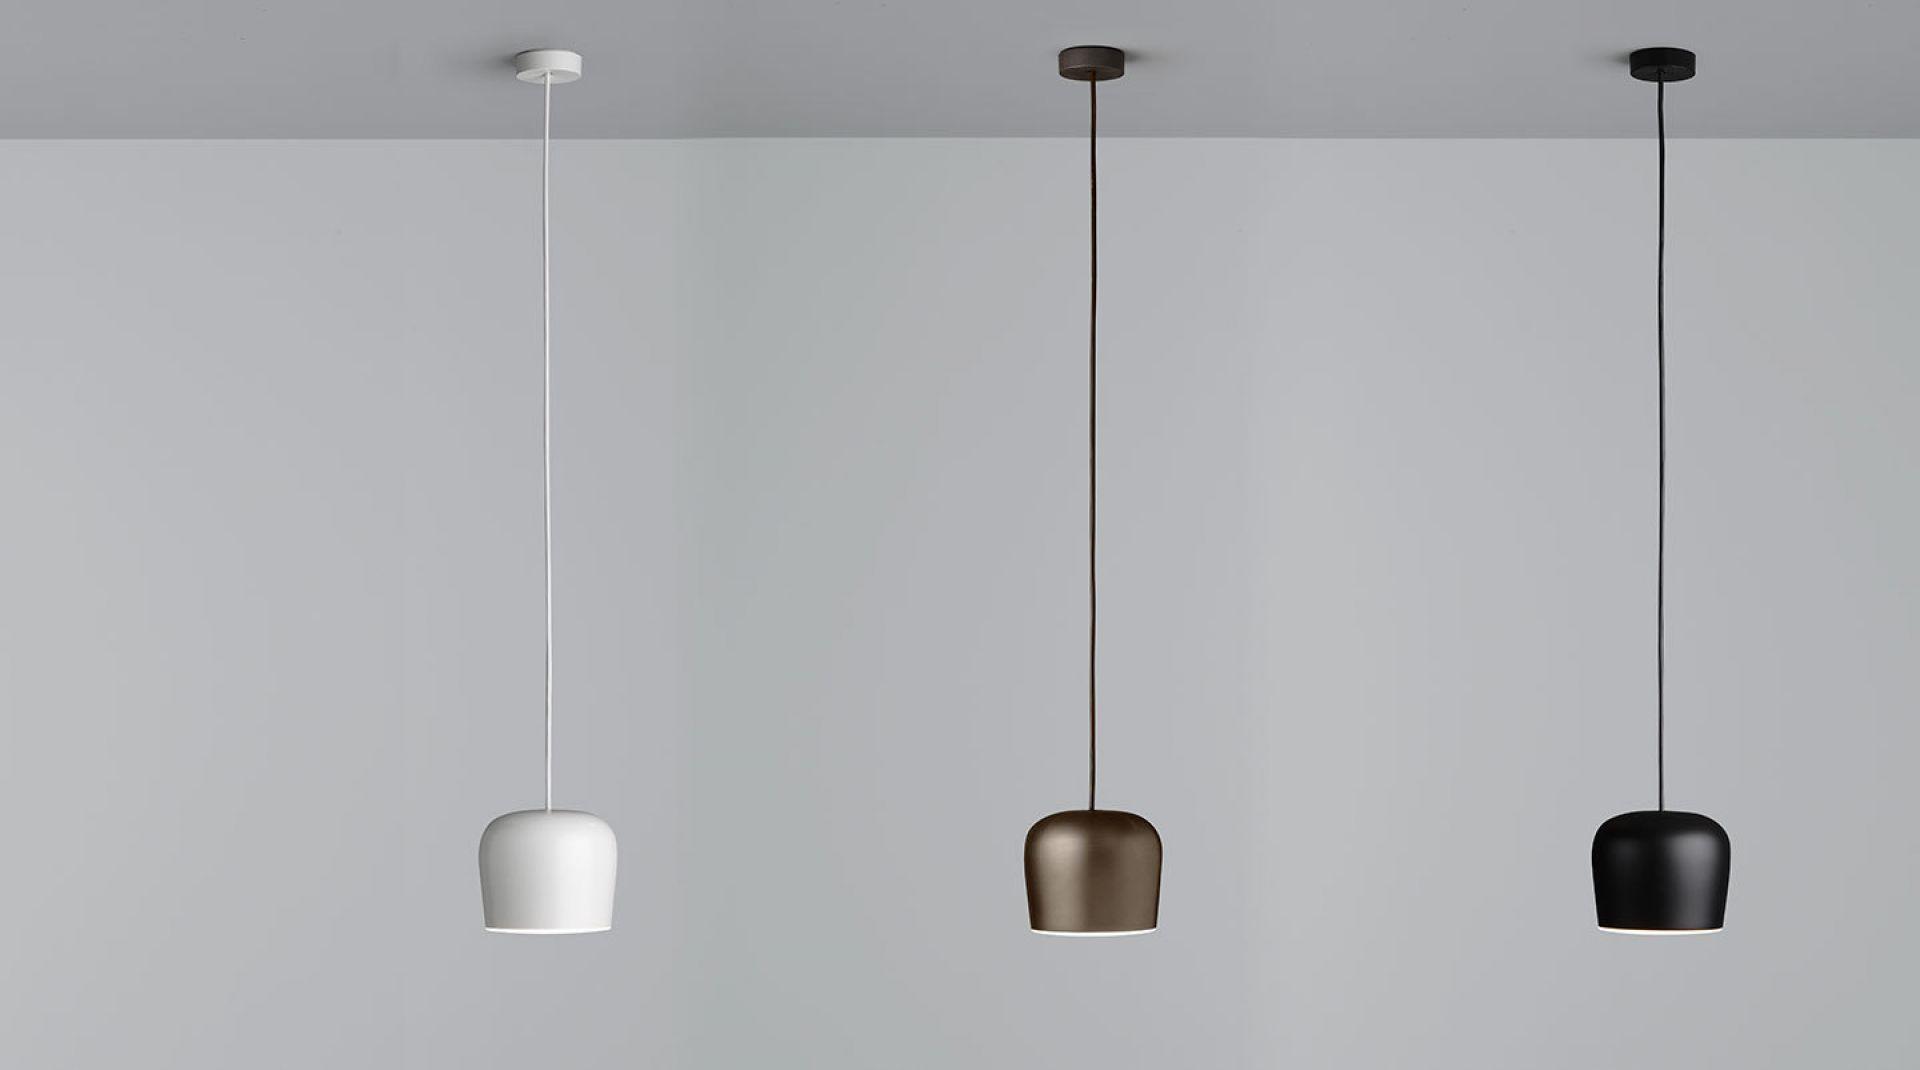 Aim Small Fix LED Pendelleuchte Flos Schwarz mit Dimmer